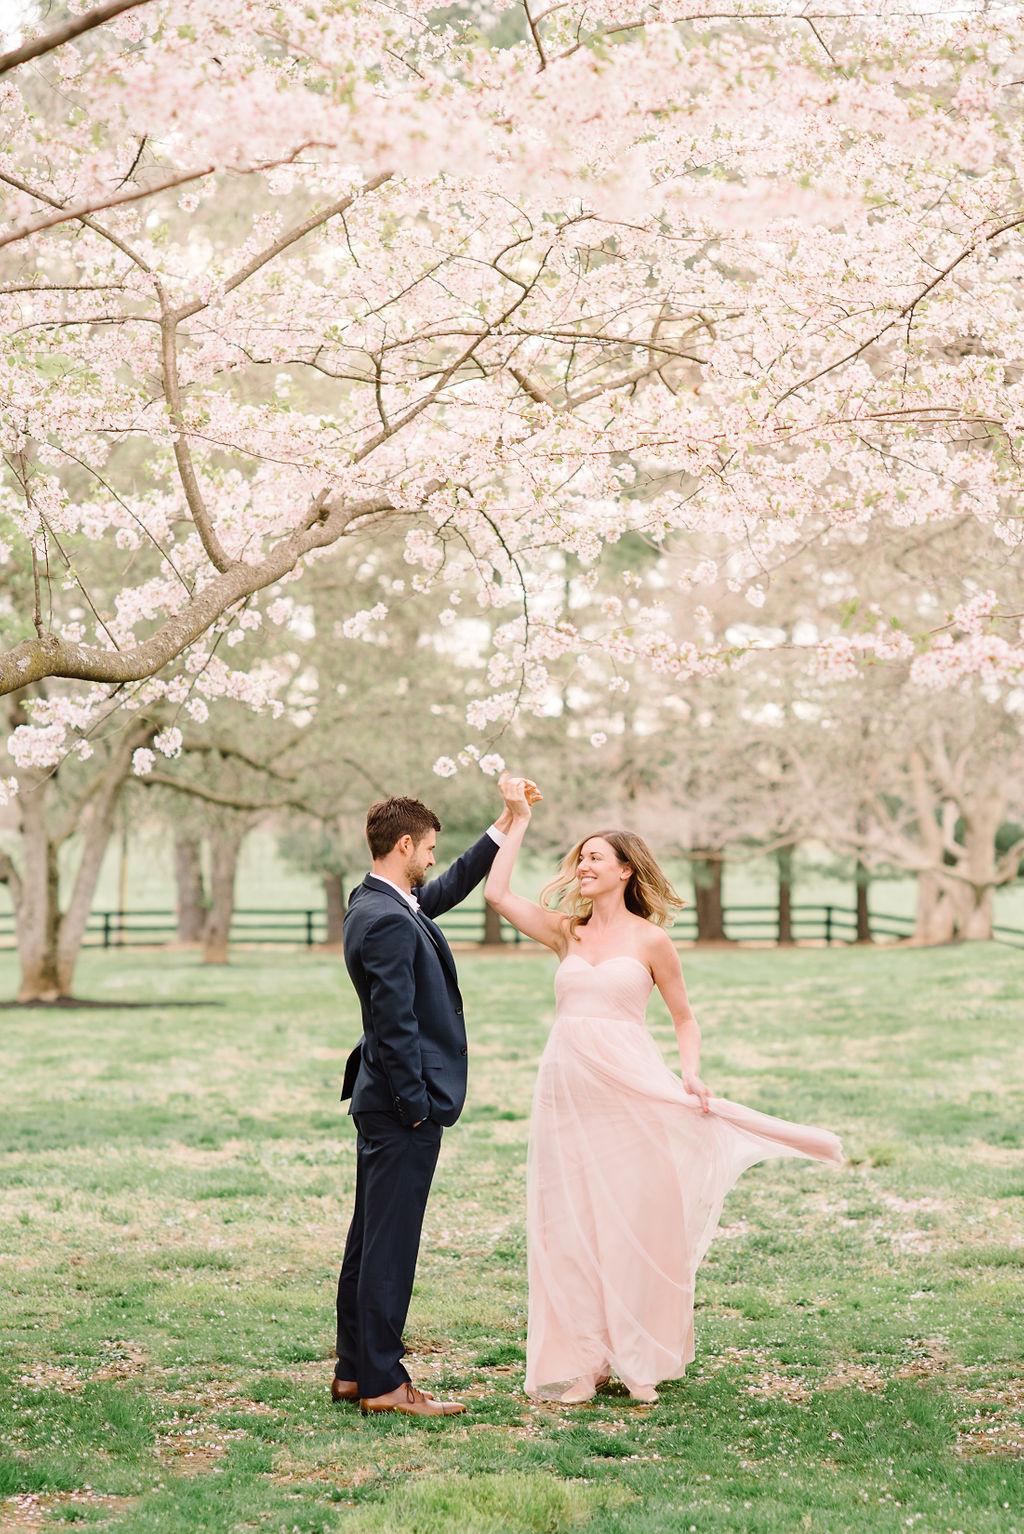 KrystaNormanPhotography_MandyChris_CherryBlossoms-21.jpg